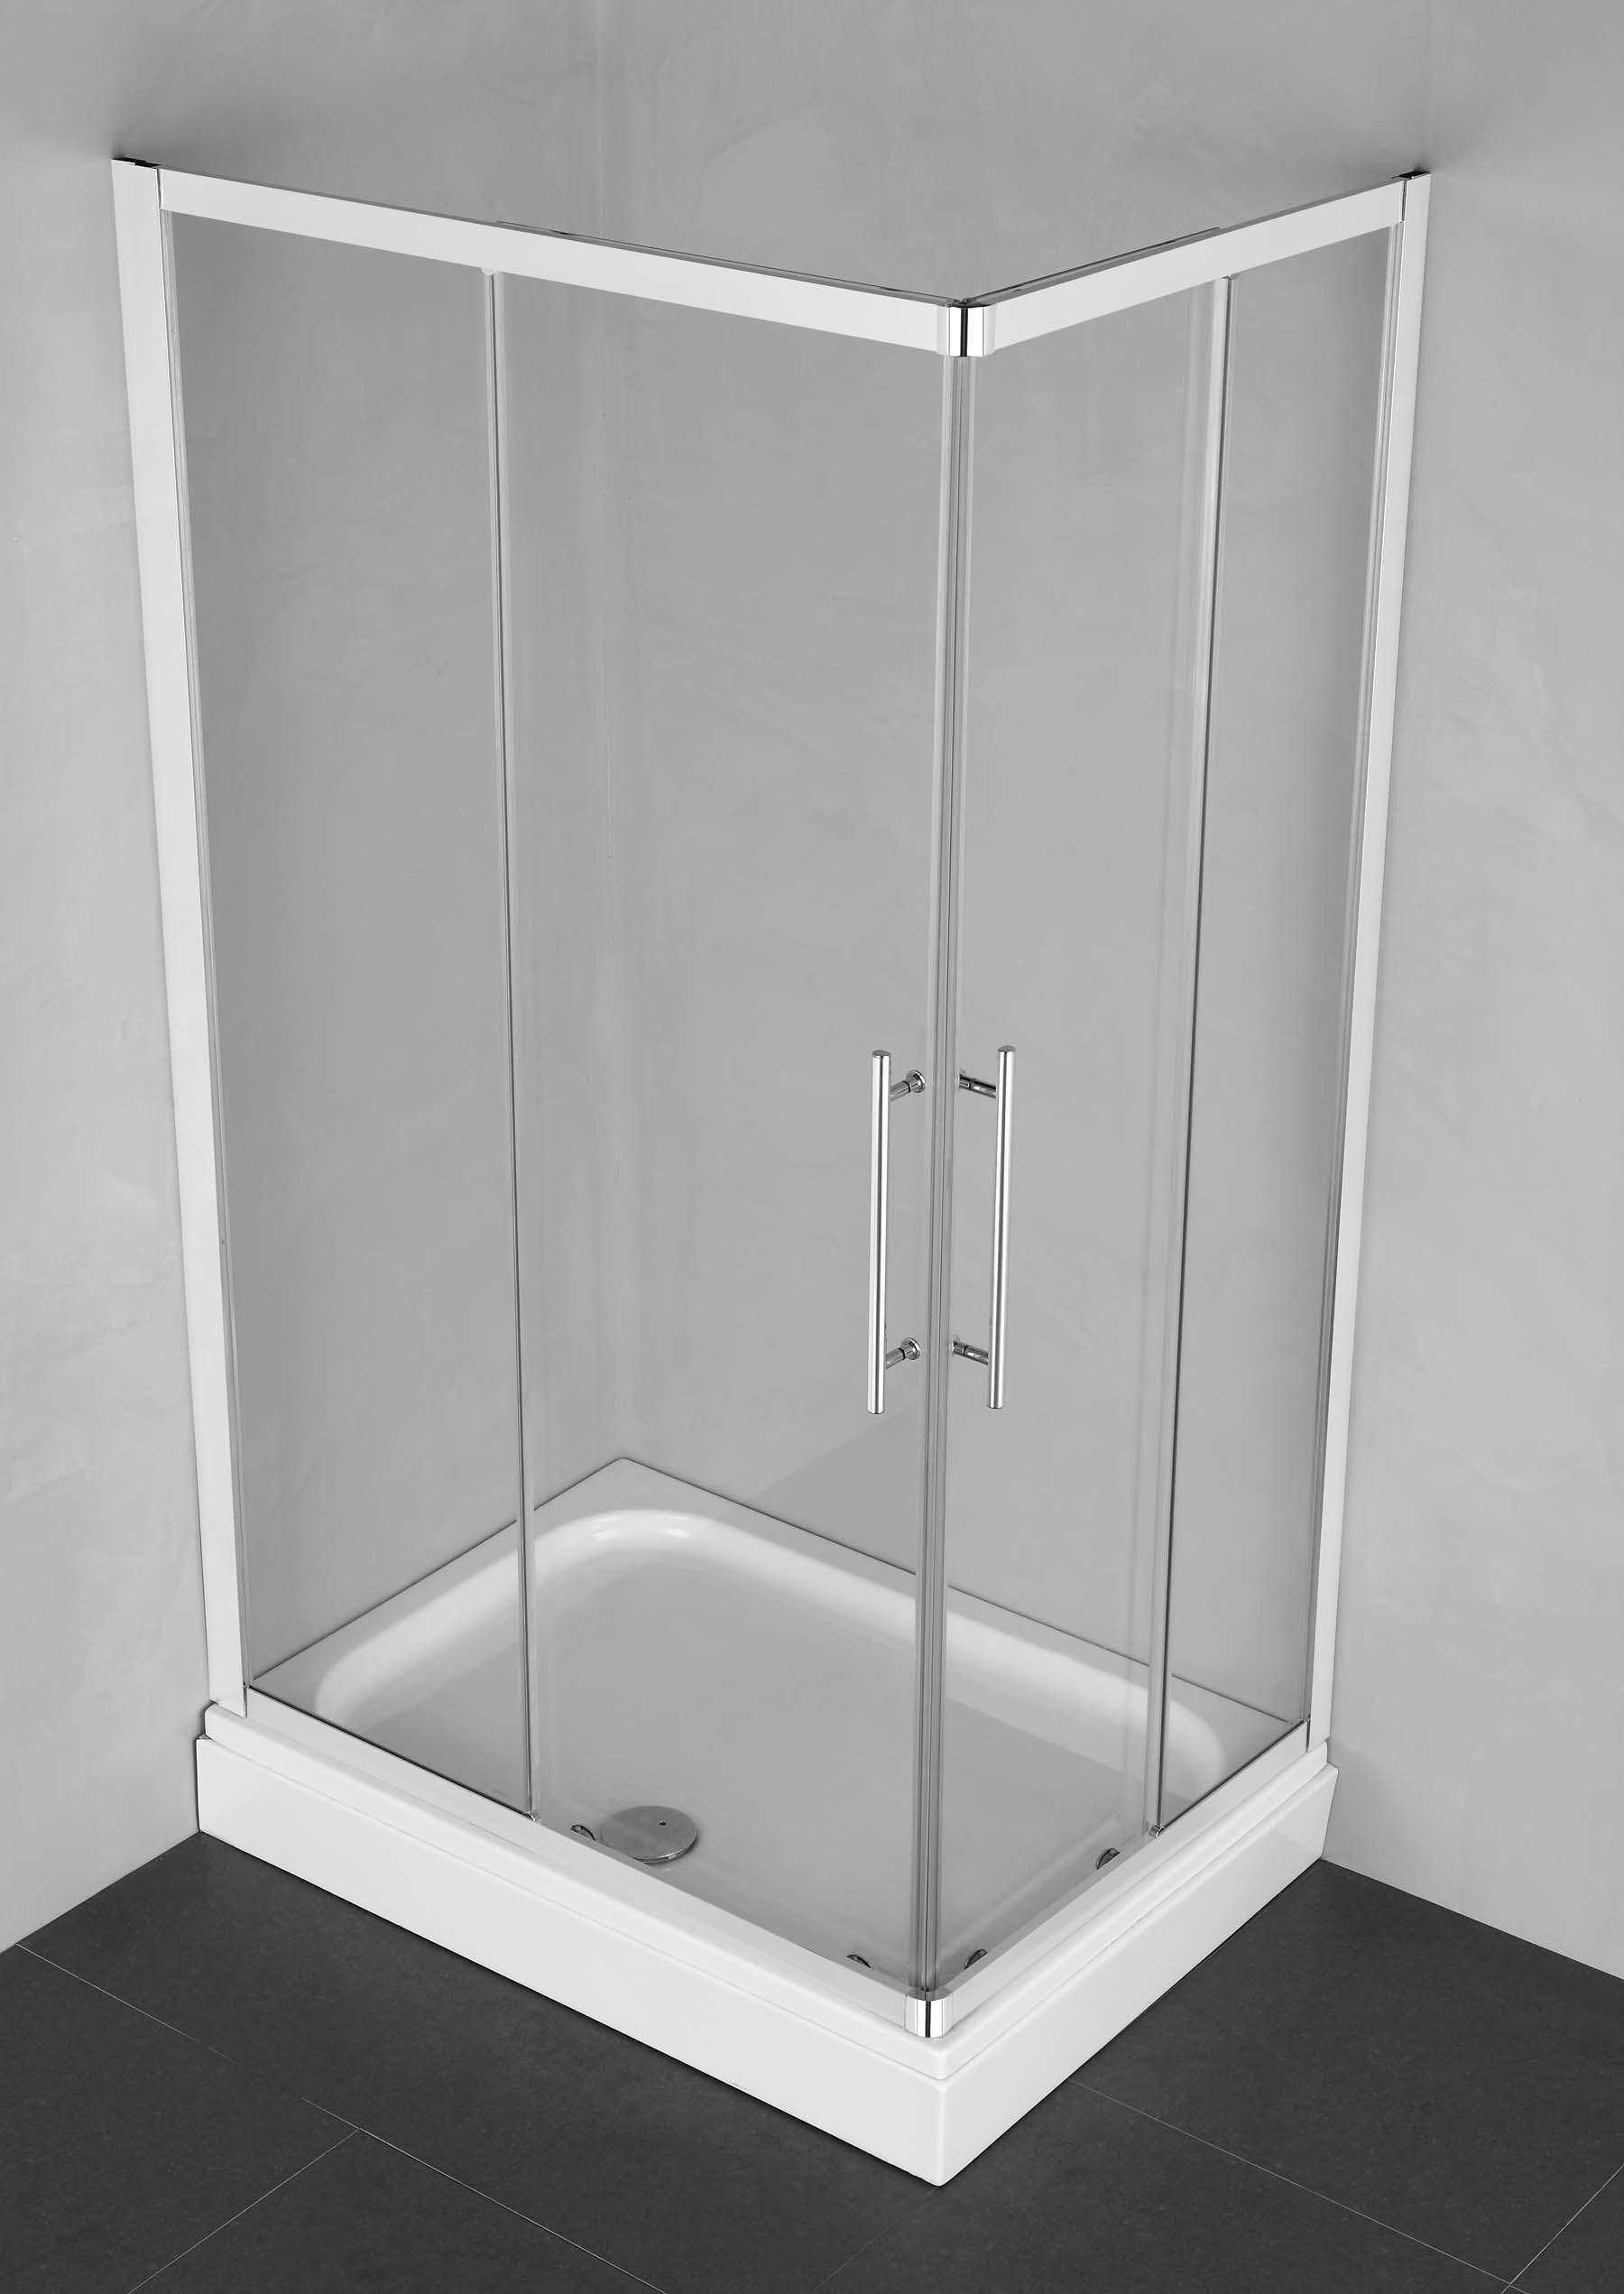 China Car Corner Sliding Shower Enclosure Shower Door Shower Room Photos A